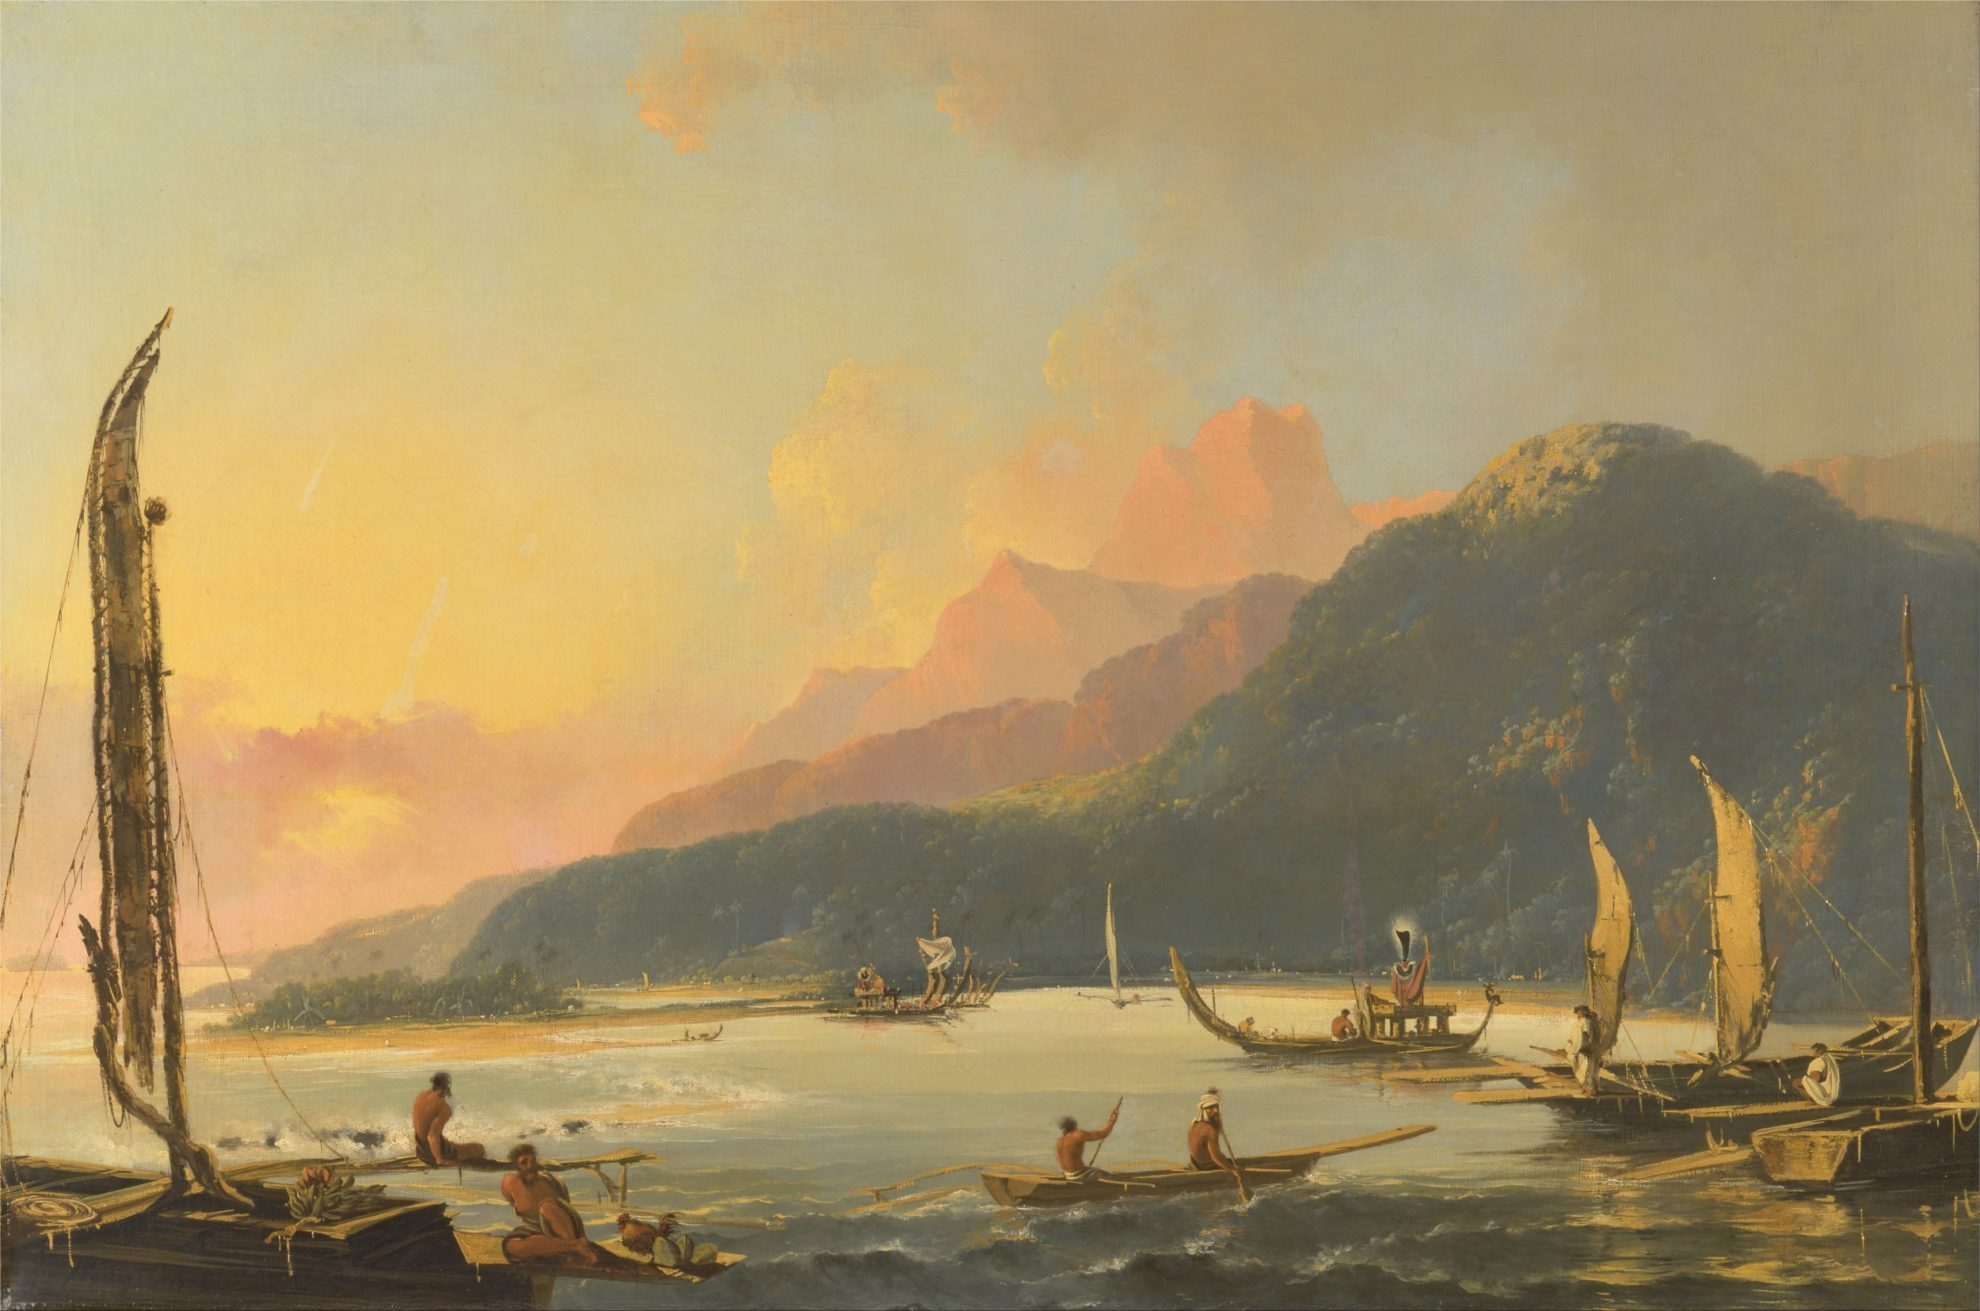 William_Hodges_-_Tahitian_War_Galleys_in_Matavai_Bay,_Tahiti_-_Google_Art_Project